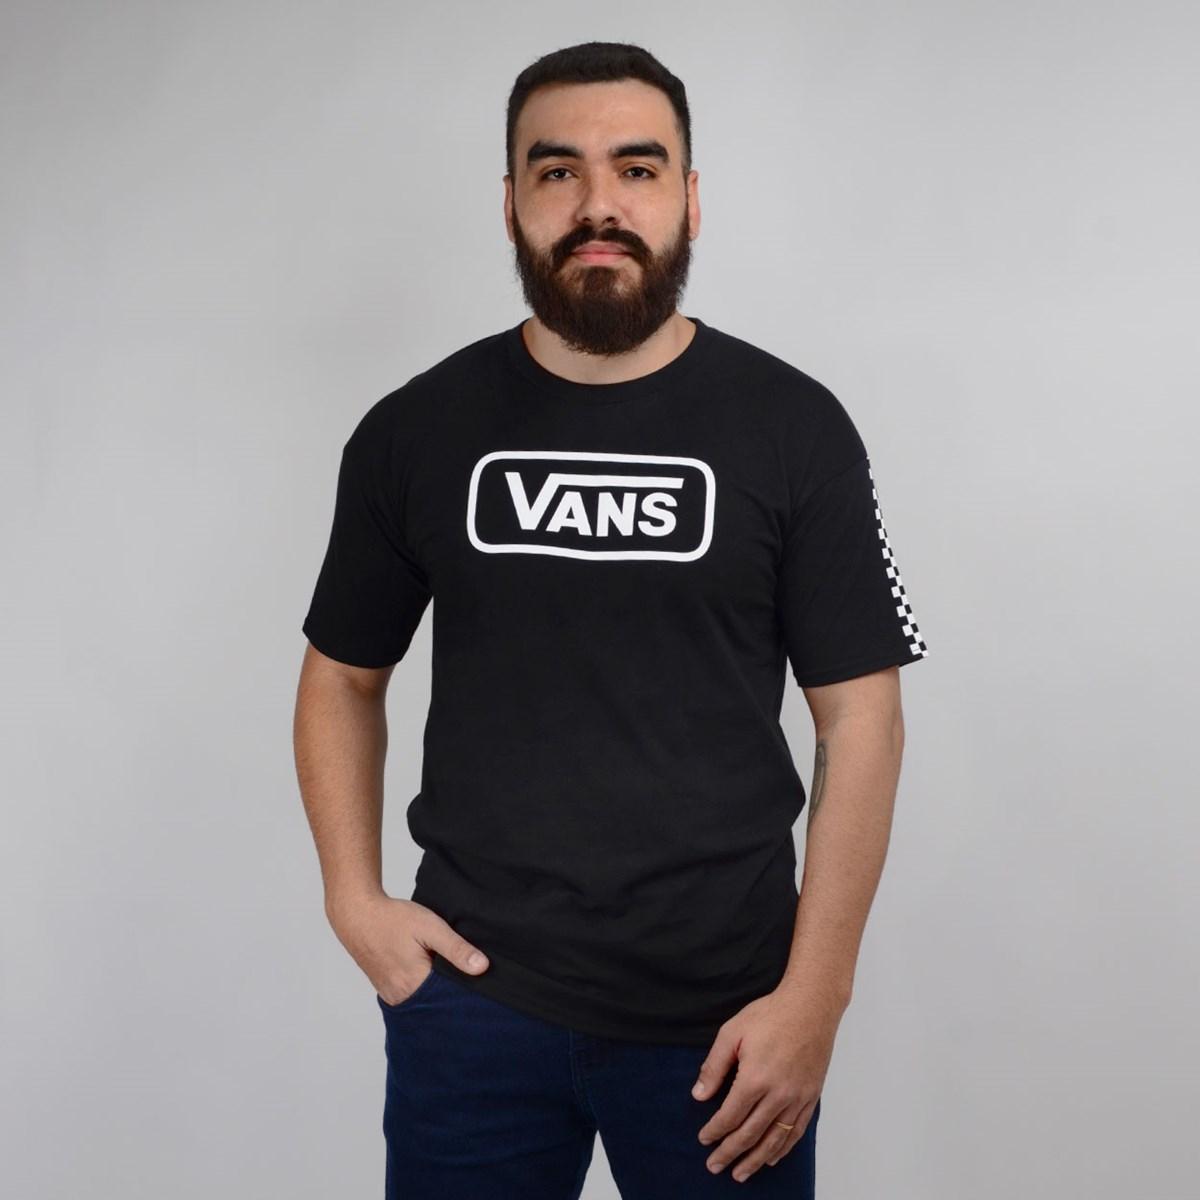 Camiseta Vans Masculina Manga Curta Fun Badge OS SS Black VN0A47WPBLK